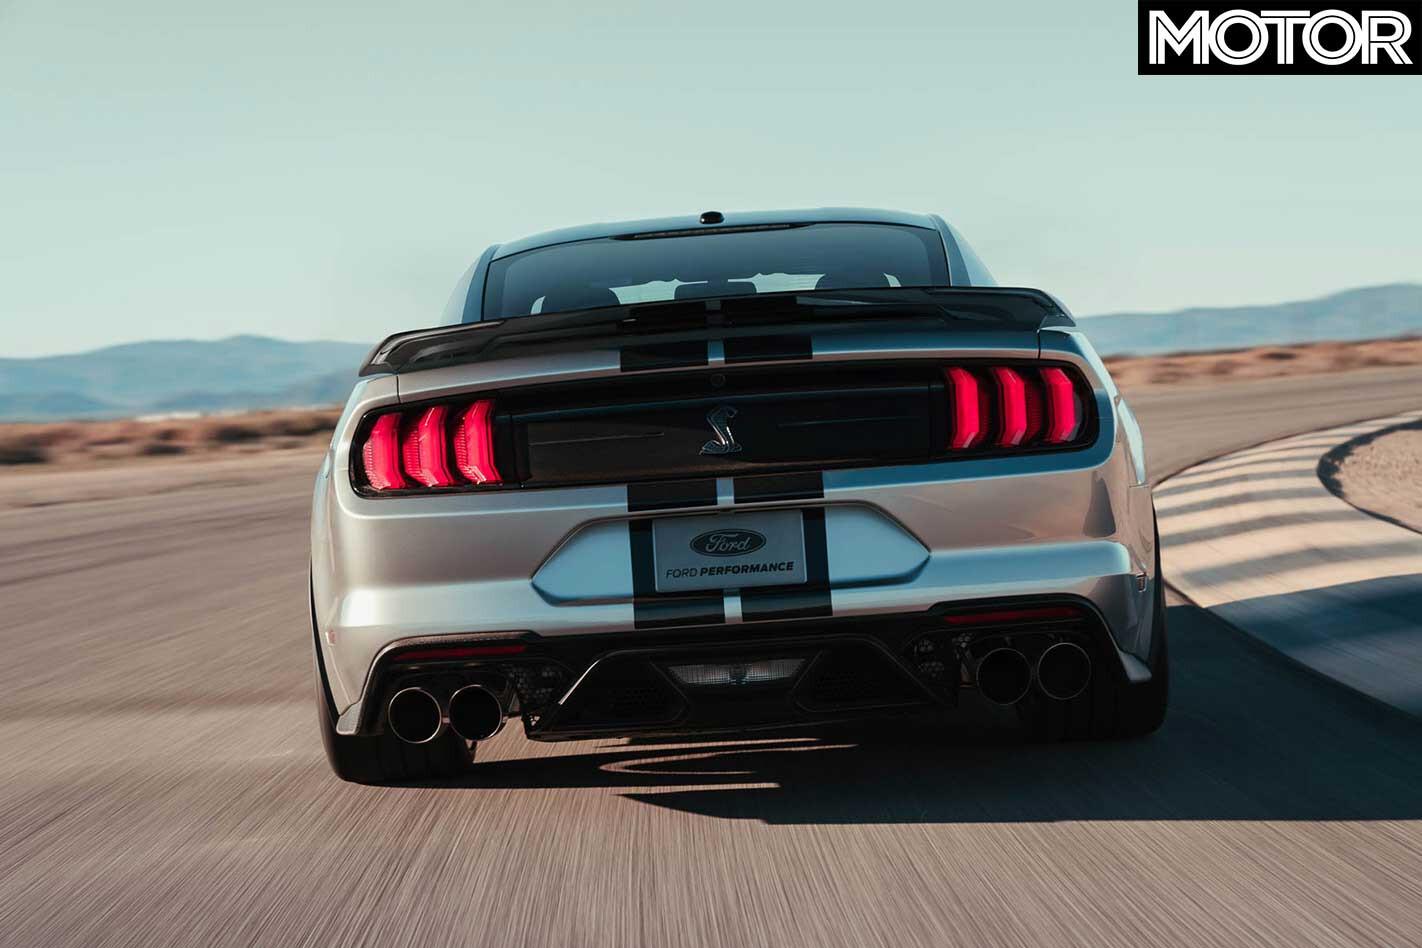 2020 Ford Mustang Shelby GT 500 Rear 281 29 Jpg